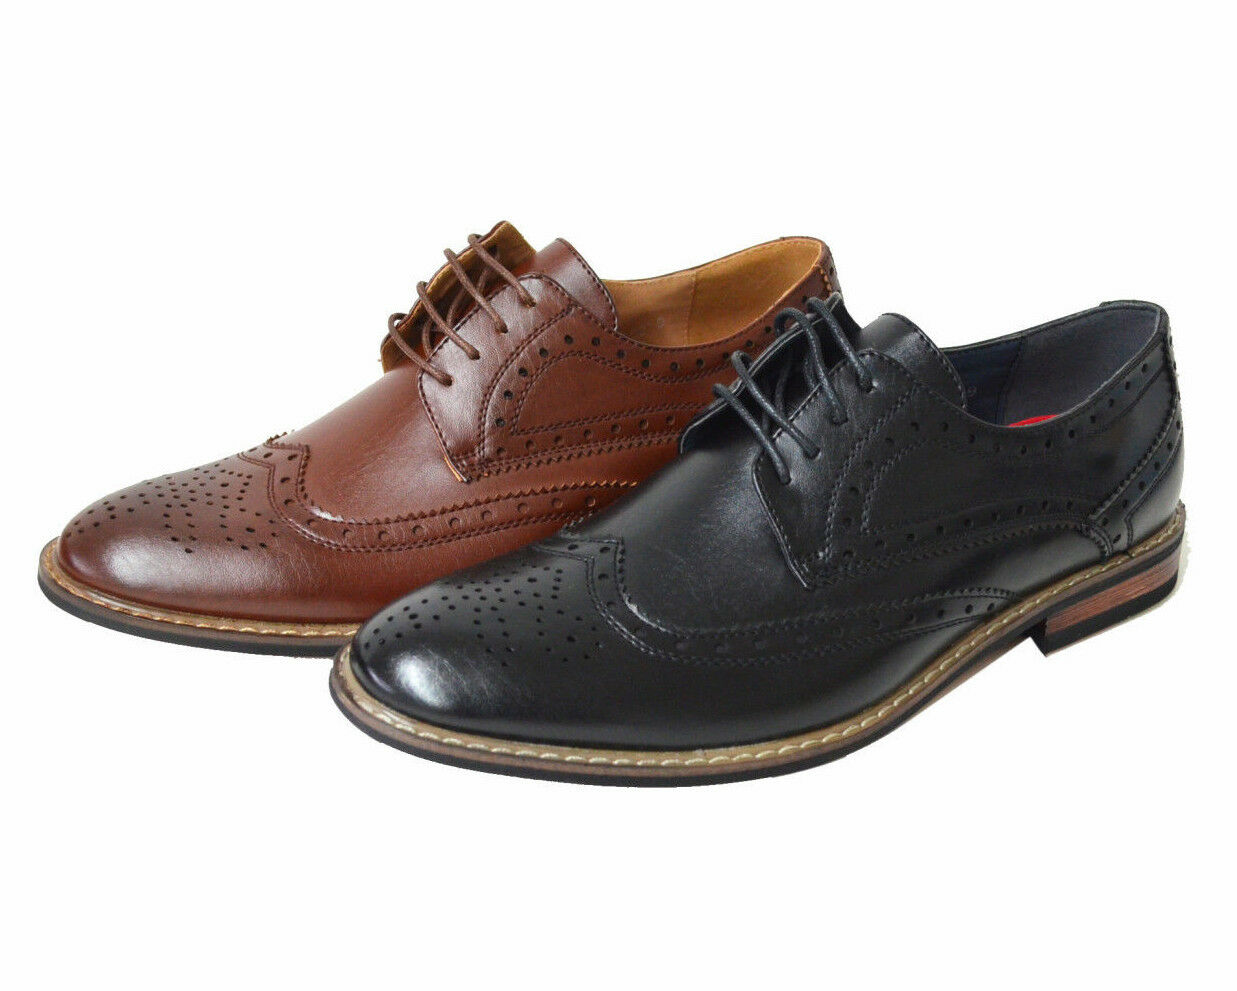 87ca4d4d08e Detalles acerca de Para Hombre Clásico Moderno Oxford la punta del ala  lazada Zapatos De Vestir (jf-conrad-02)- mostrar título original